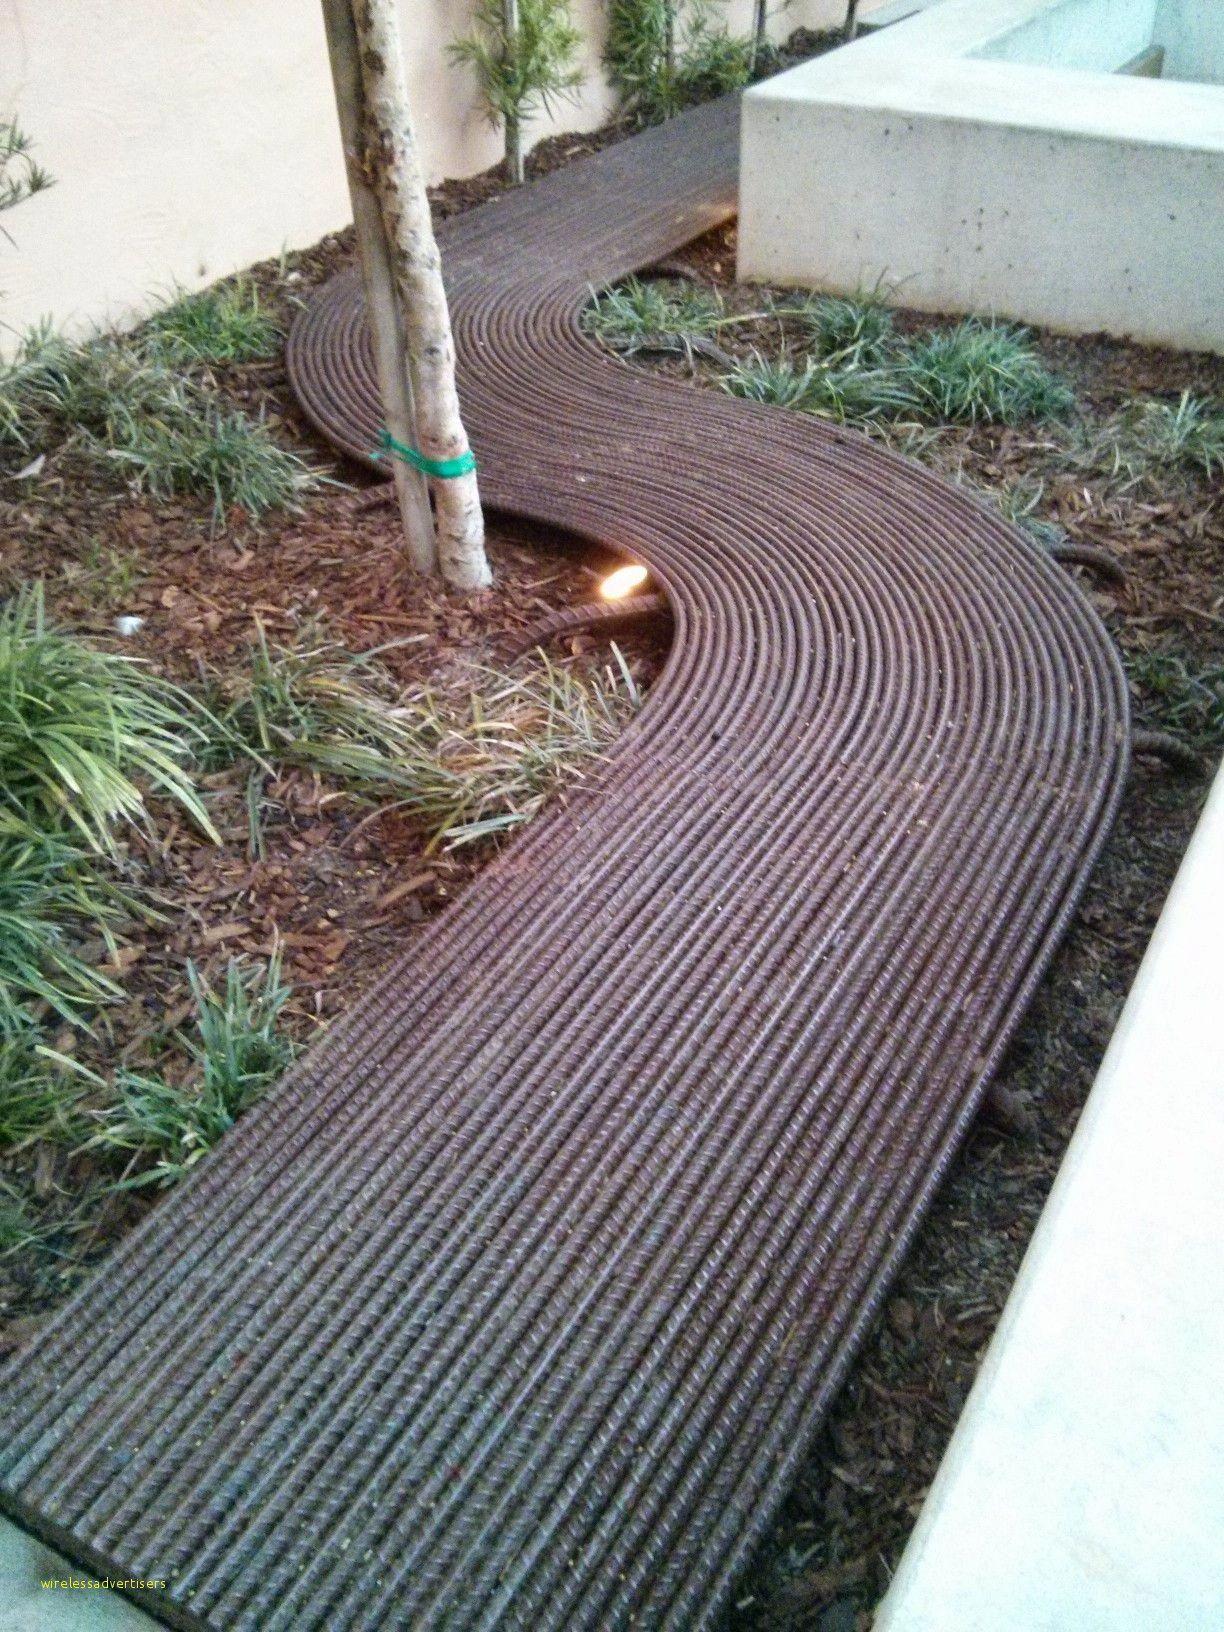 45 Exellent Garden Paths Exellent Garden Paths 14 Stylish Diy Rebar Trellis Diy Trelling Ideas And Projects Ver Modern Landscaping Garden Design Garden Paths